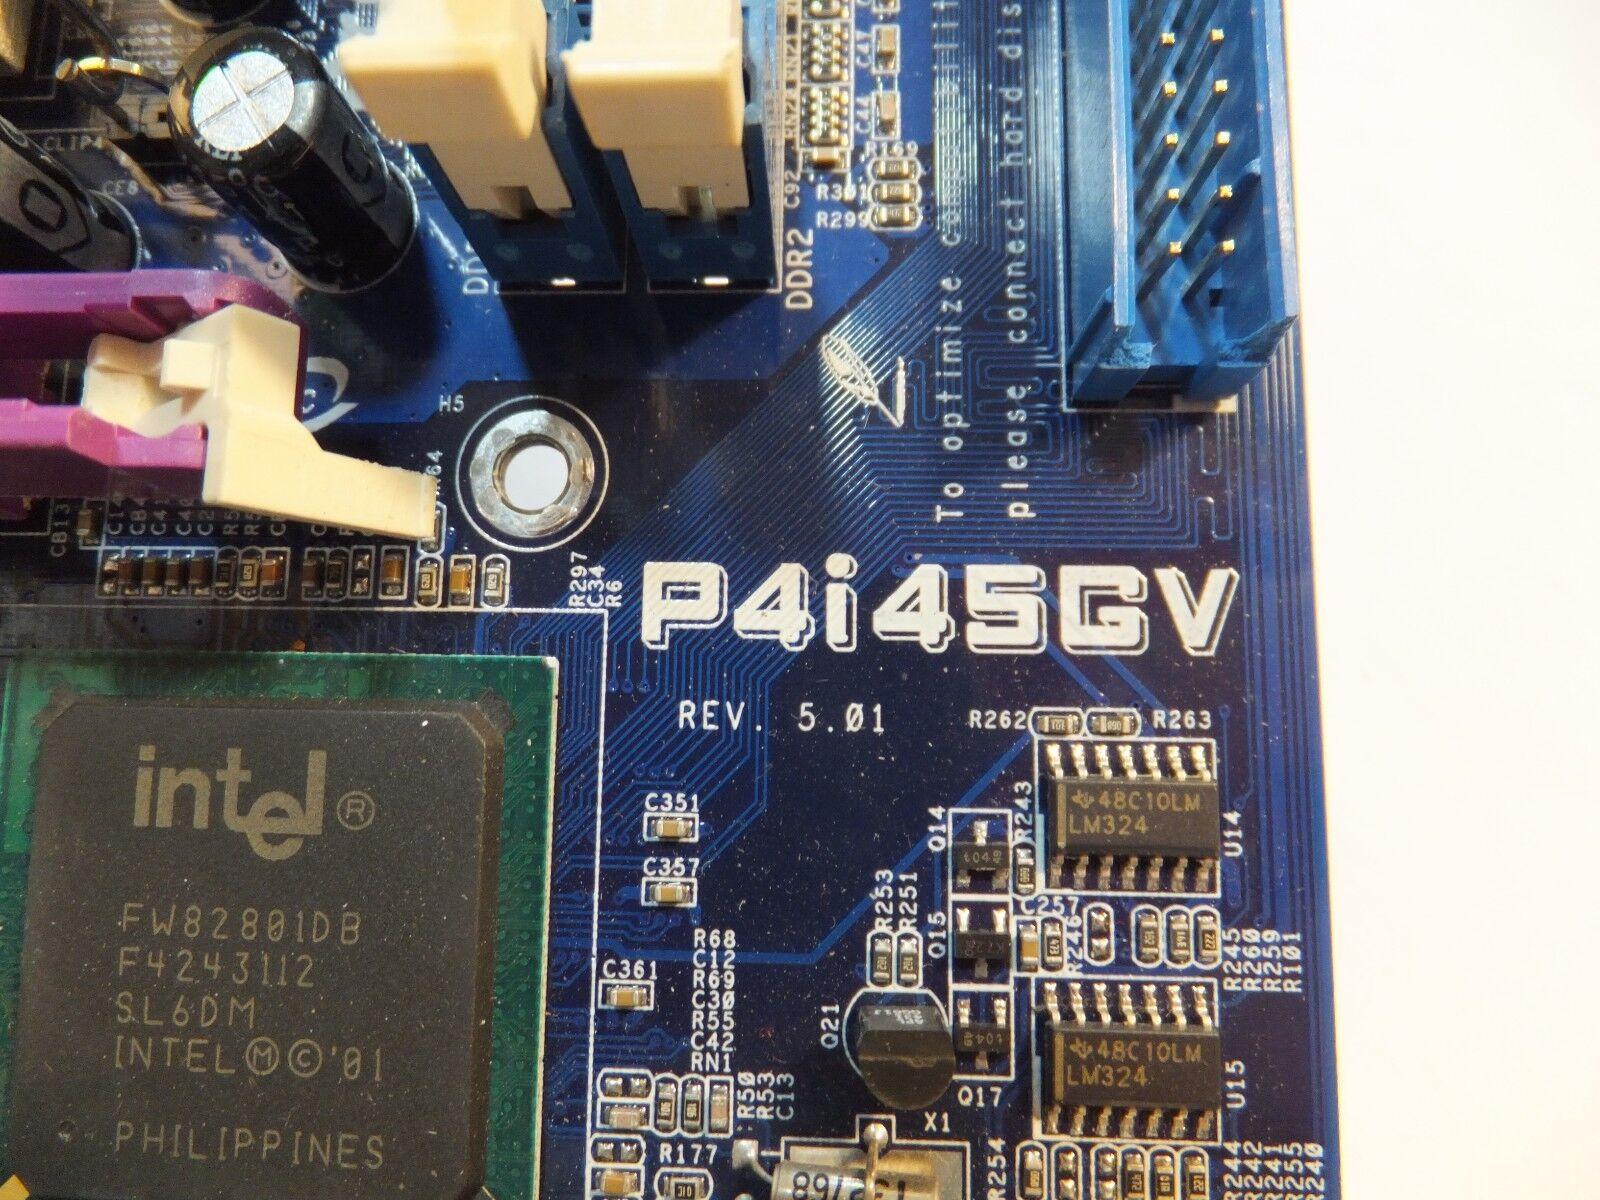 Asrock P4I45GV Rev 5.0 Drivers for Mac Download